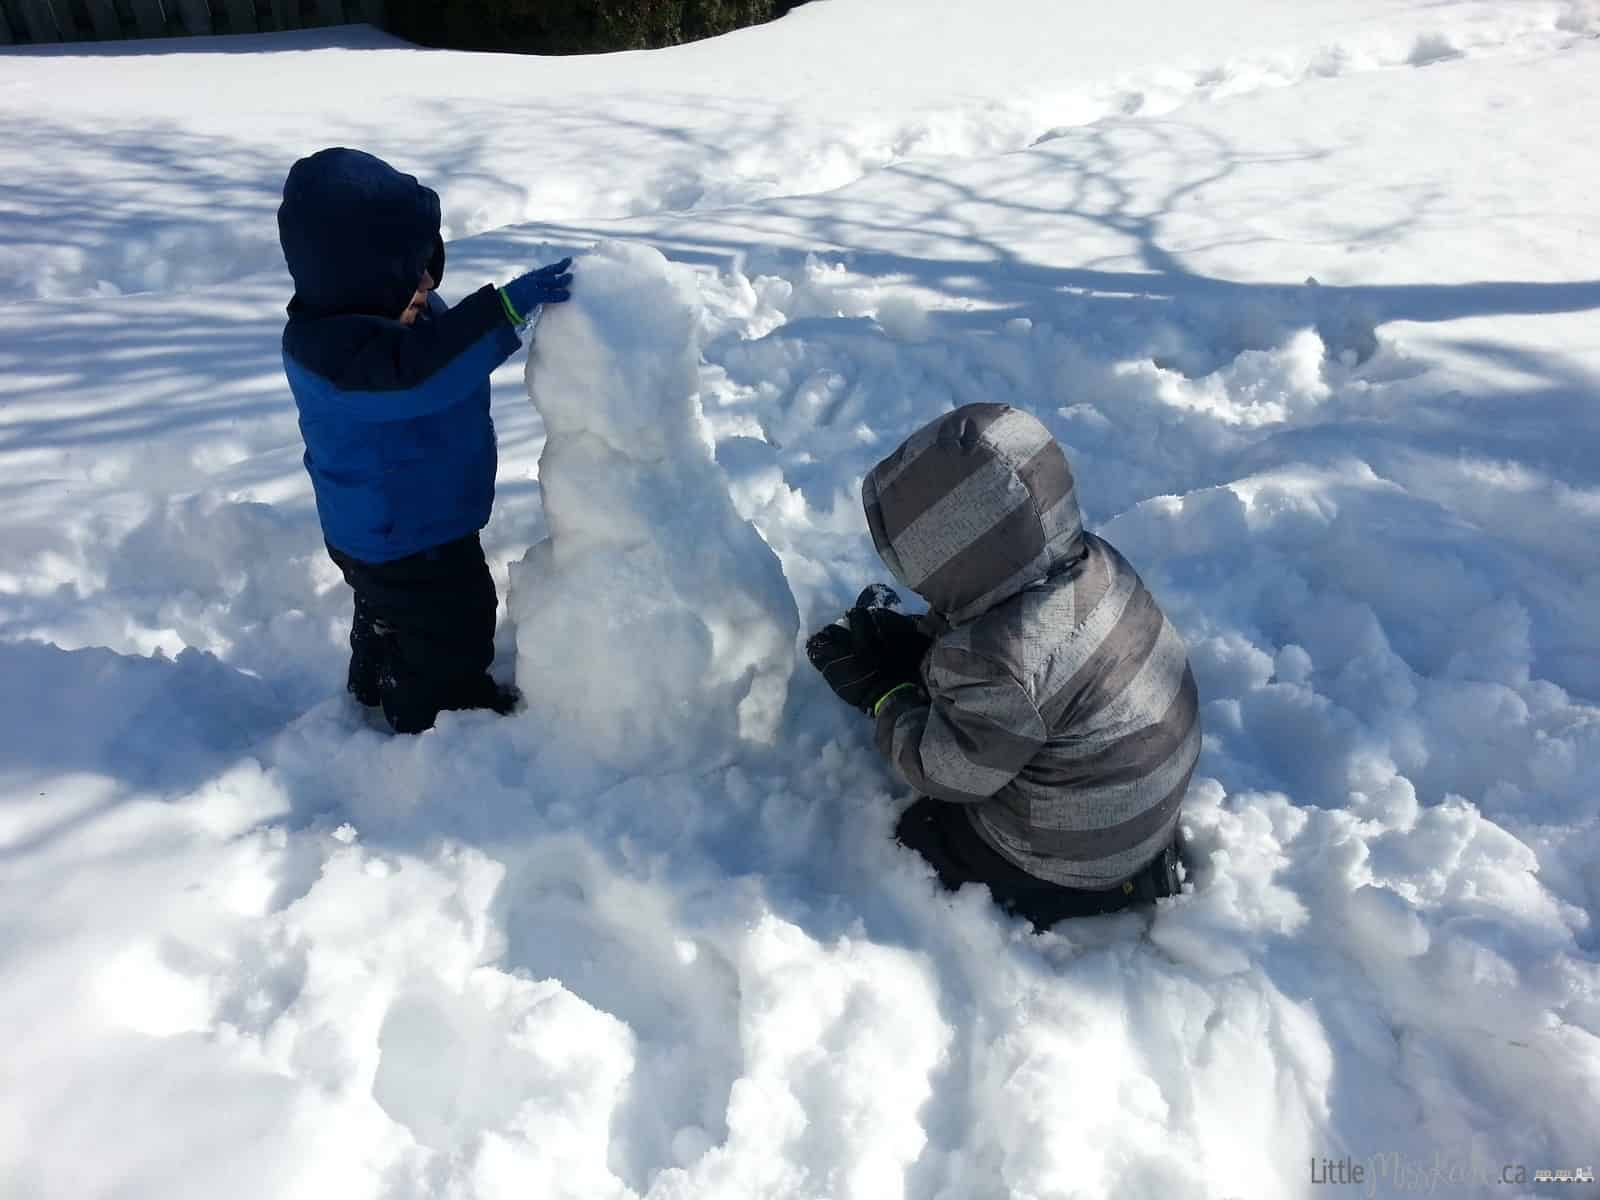 Winter fun building a snowman